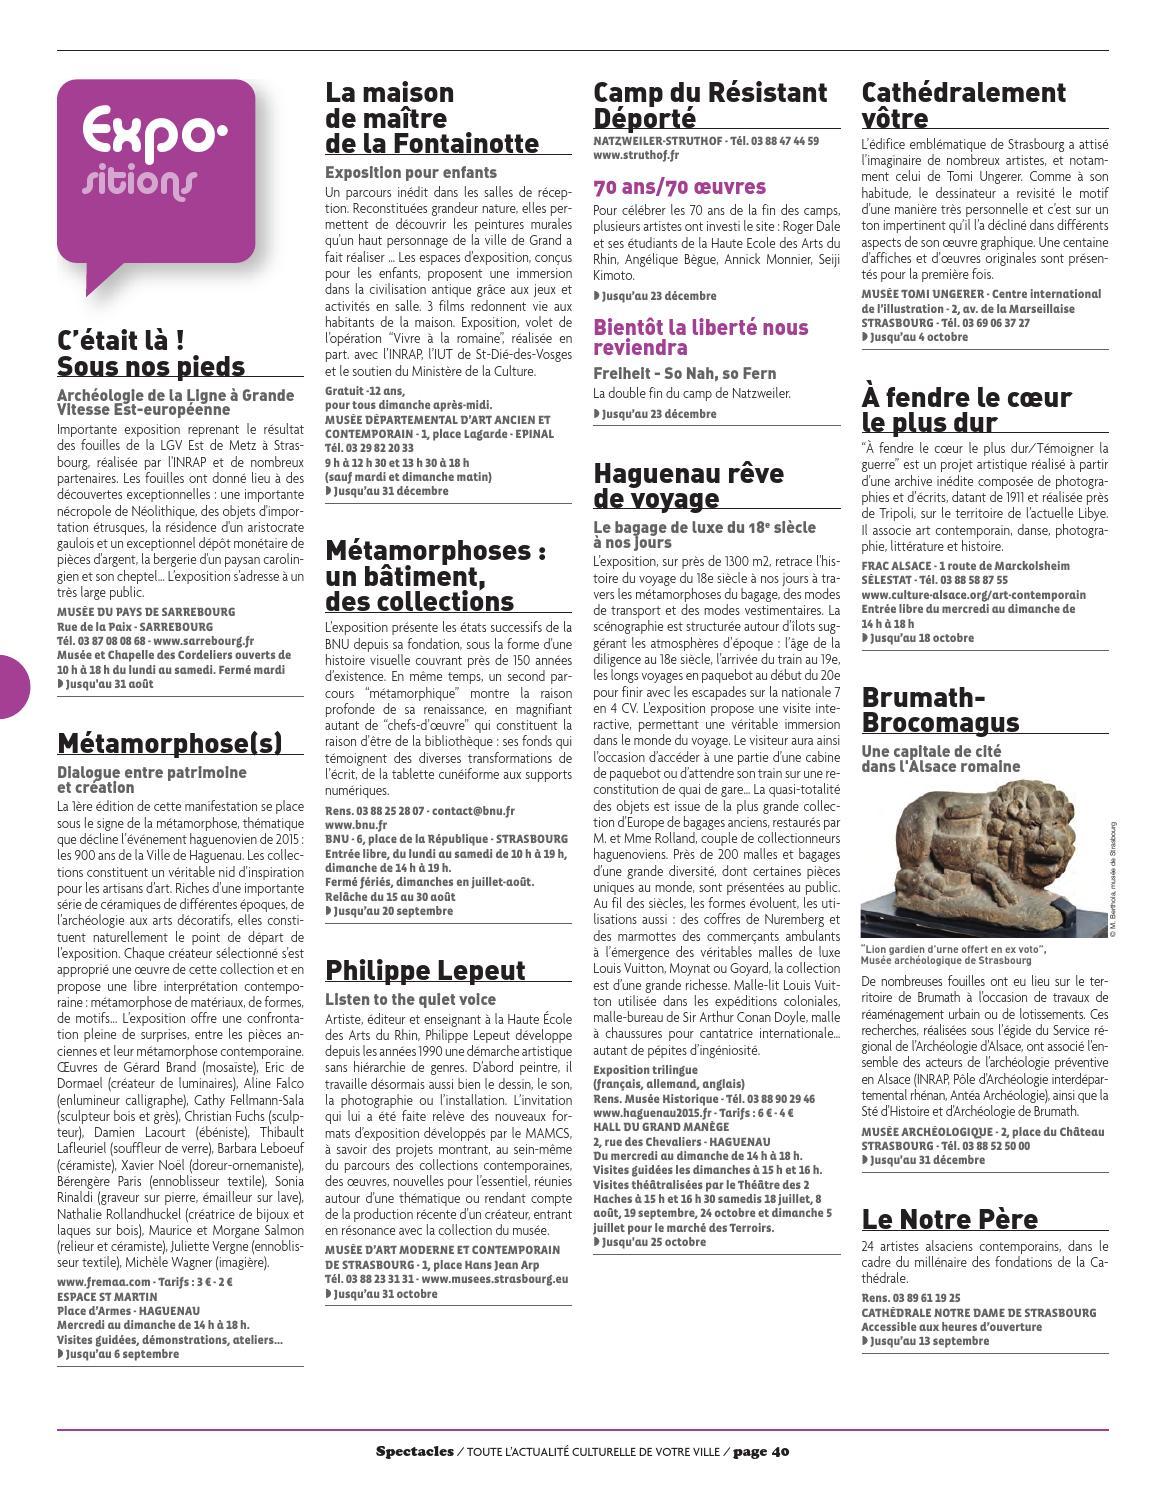 Spectacles Publications à Strasbourg n°184 / Juillet/Août